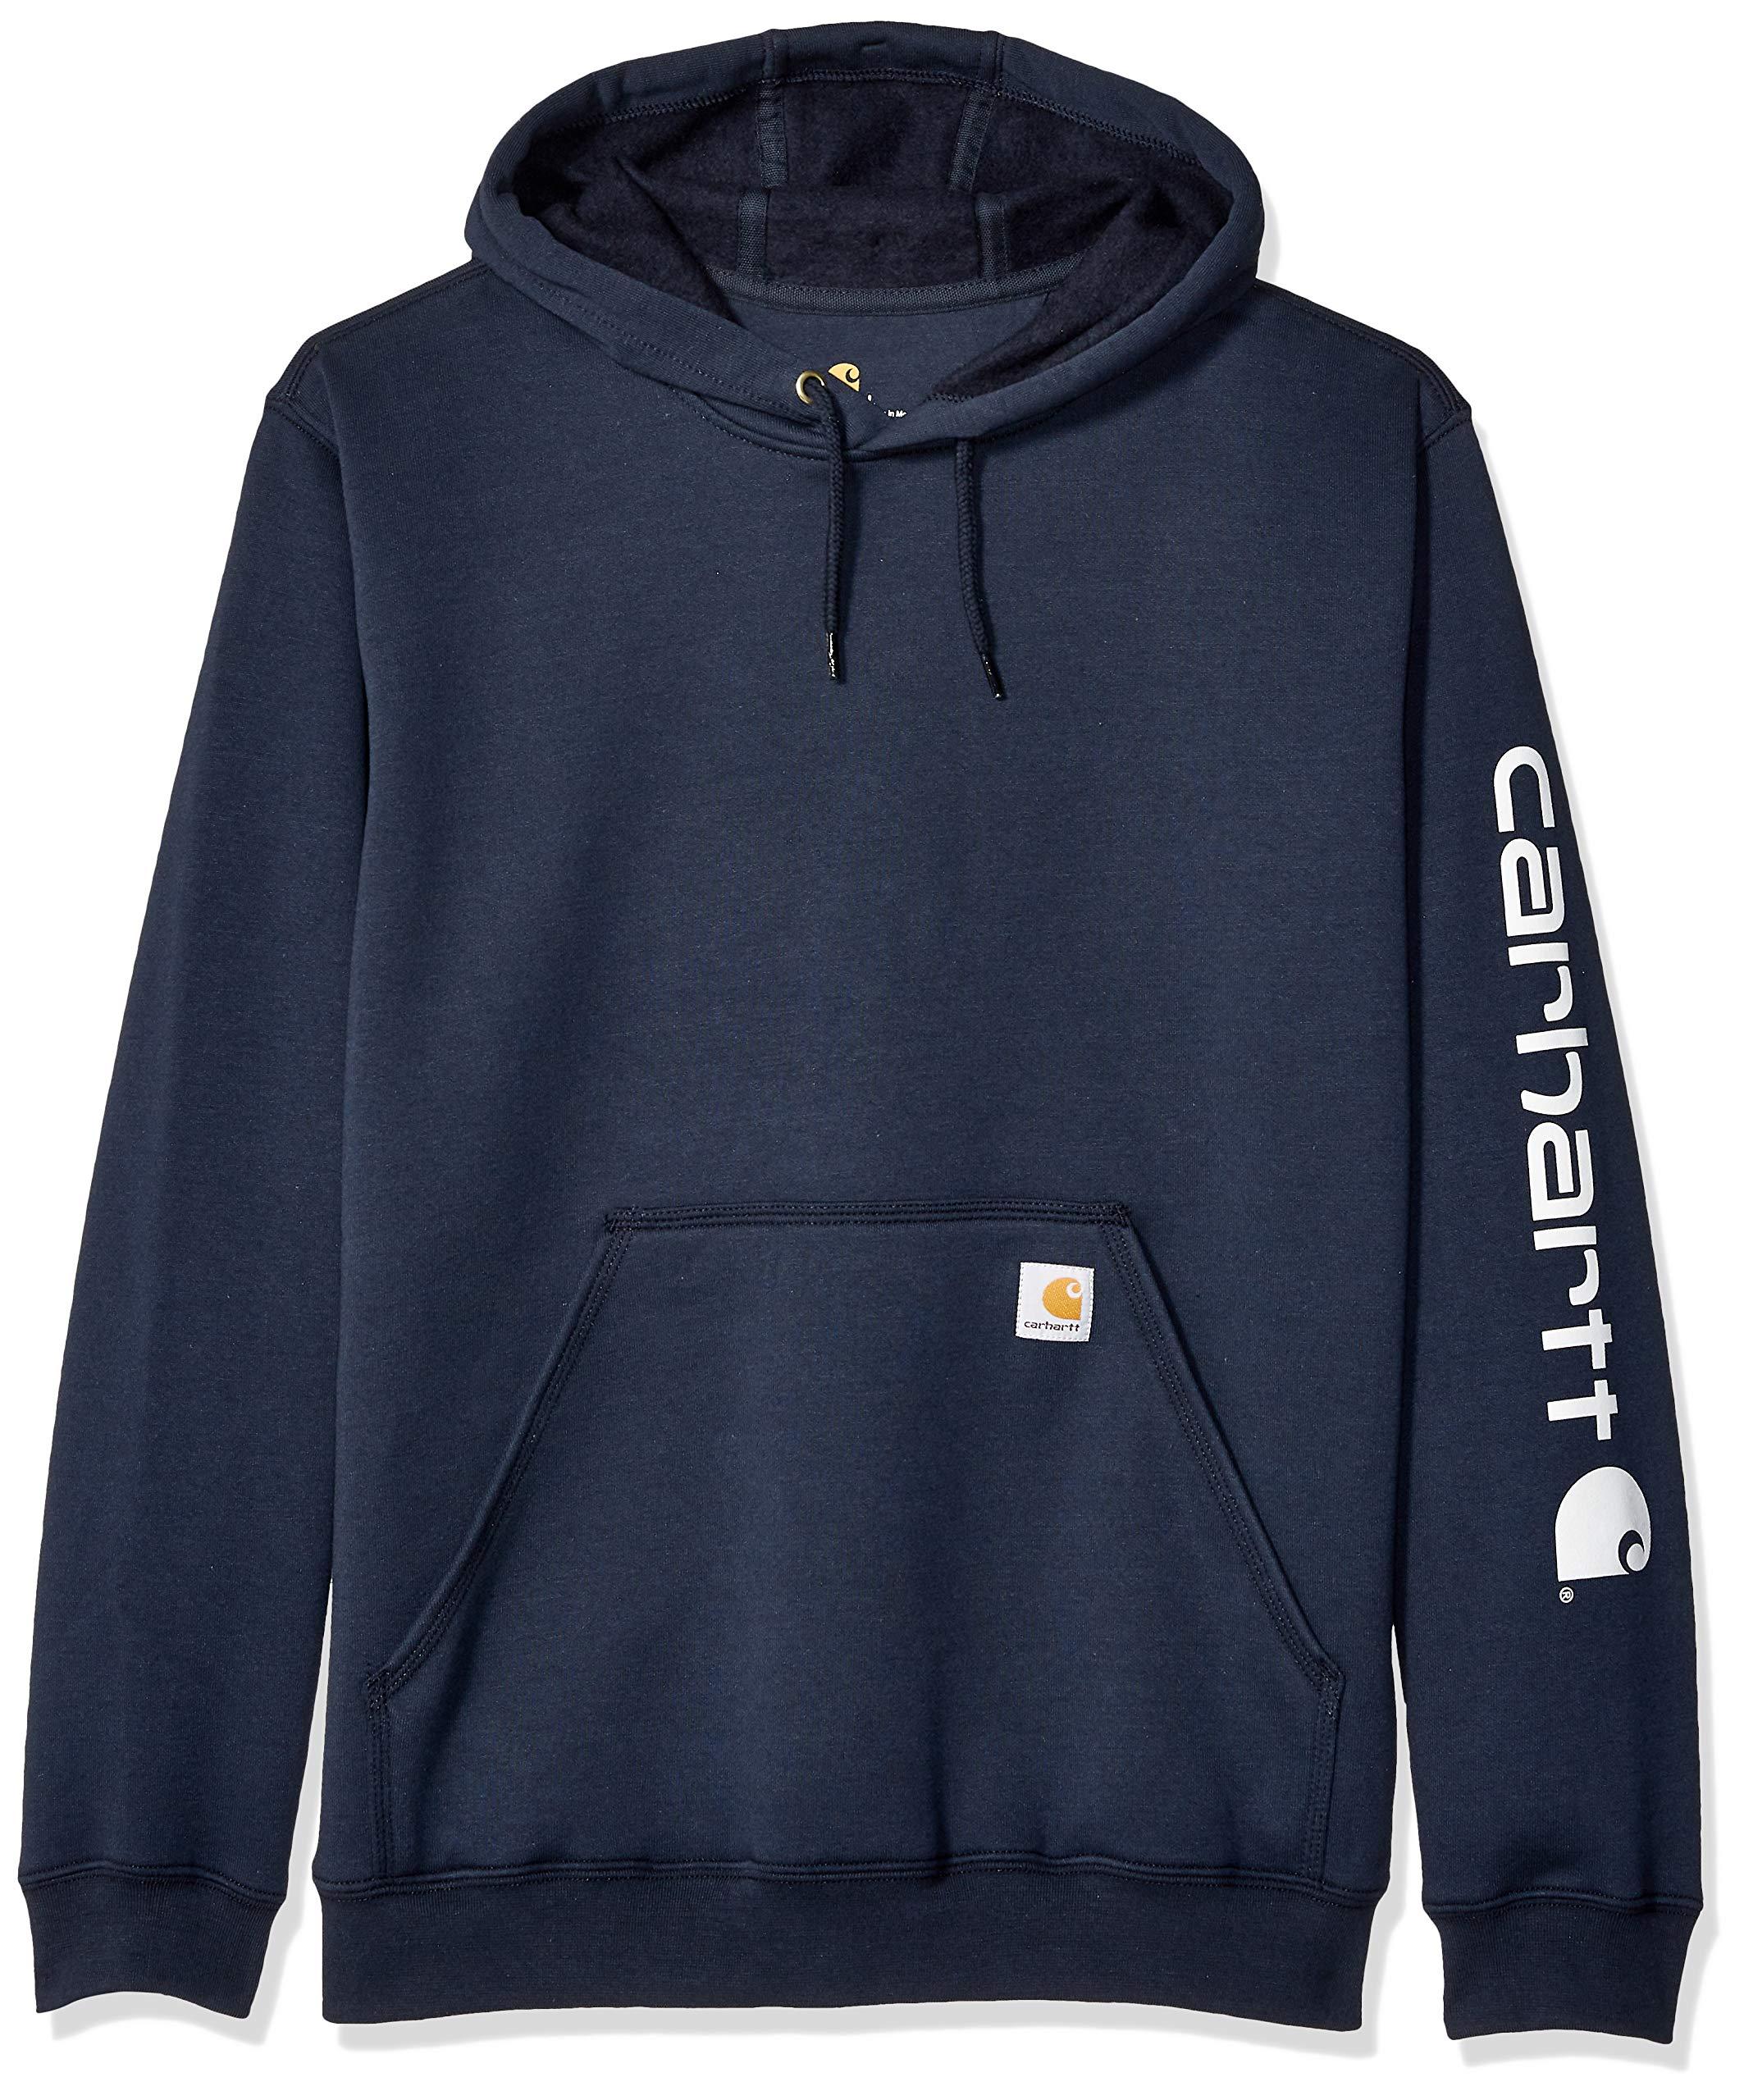 Carhartt Men's Midweight Sleeve Logo Hooded Sweatshirt,New Navy,Small